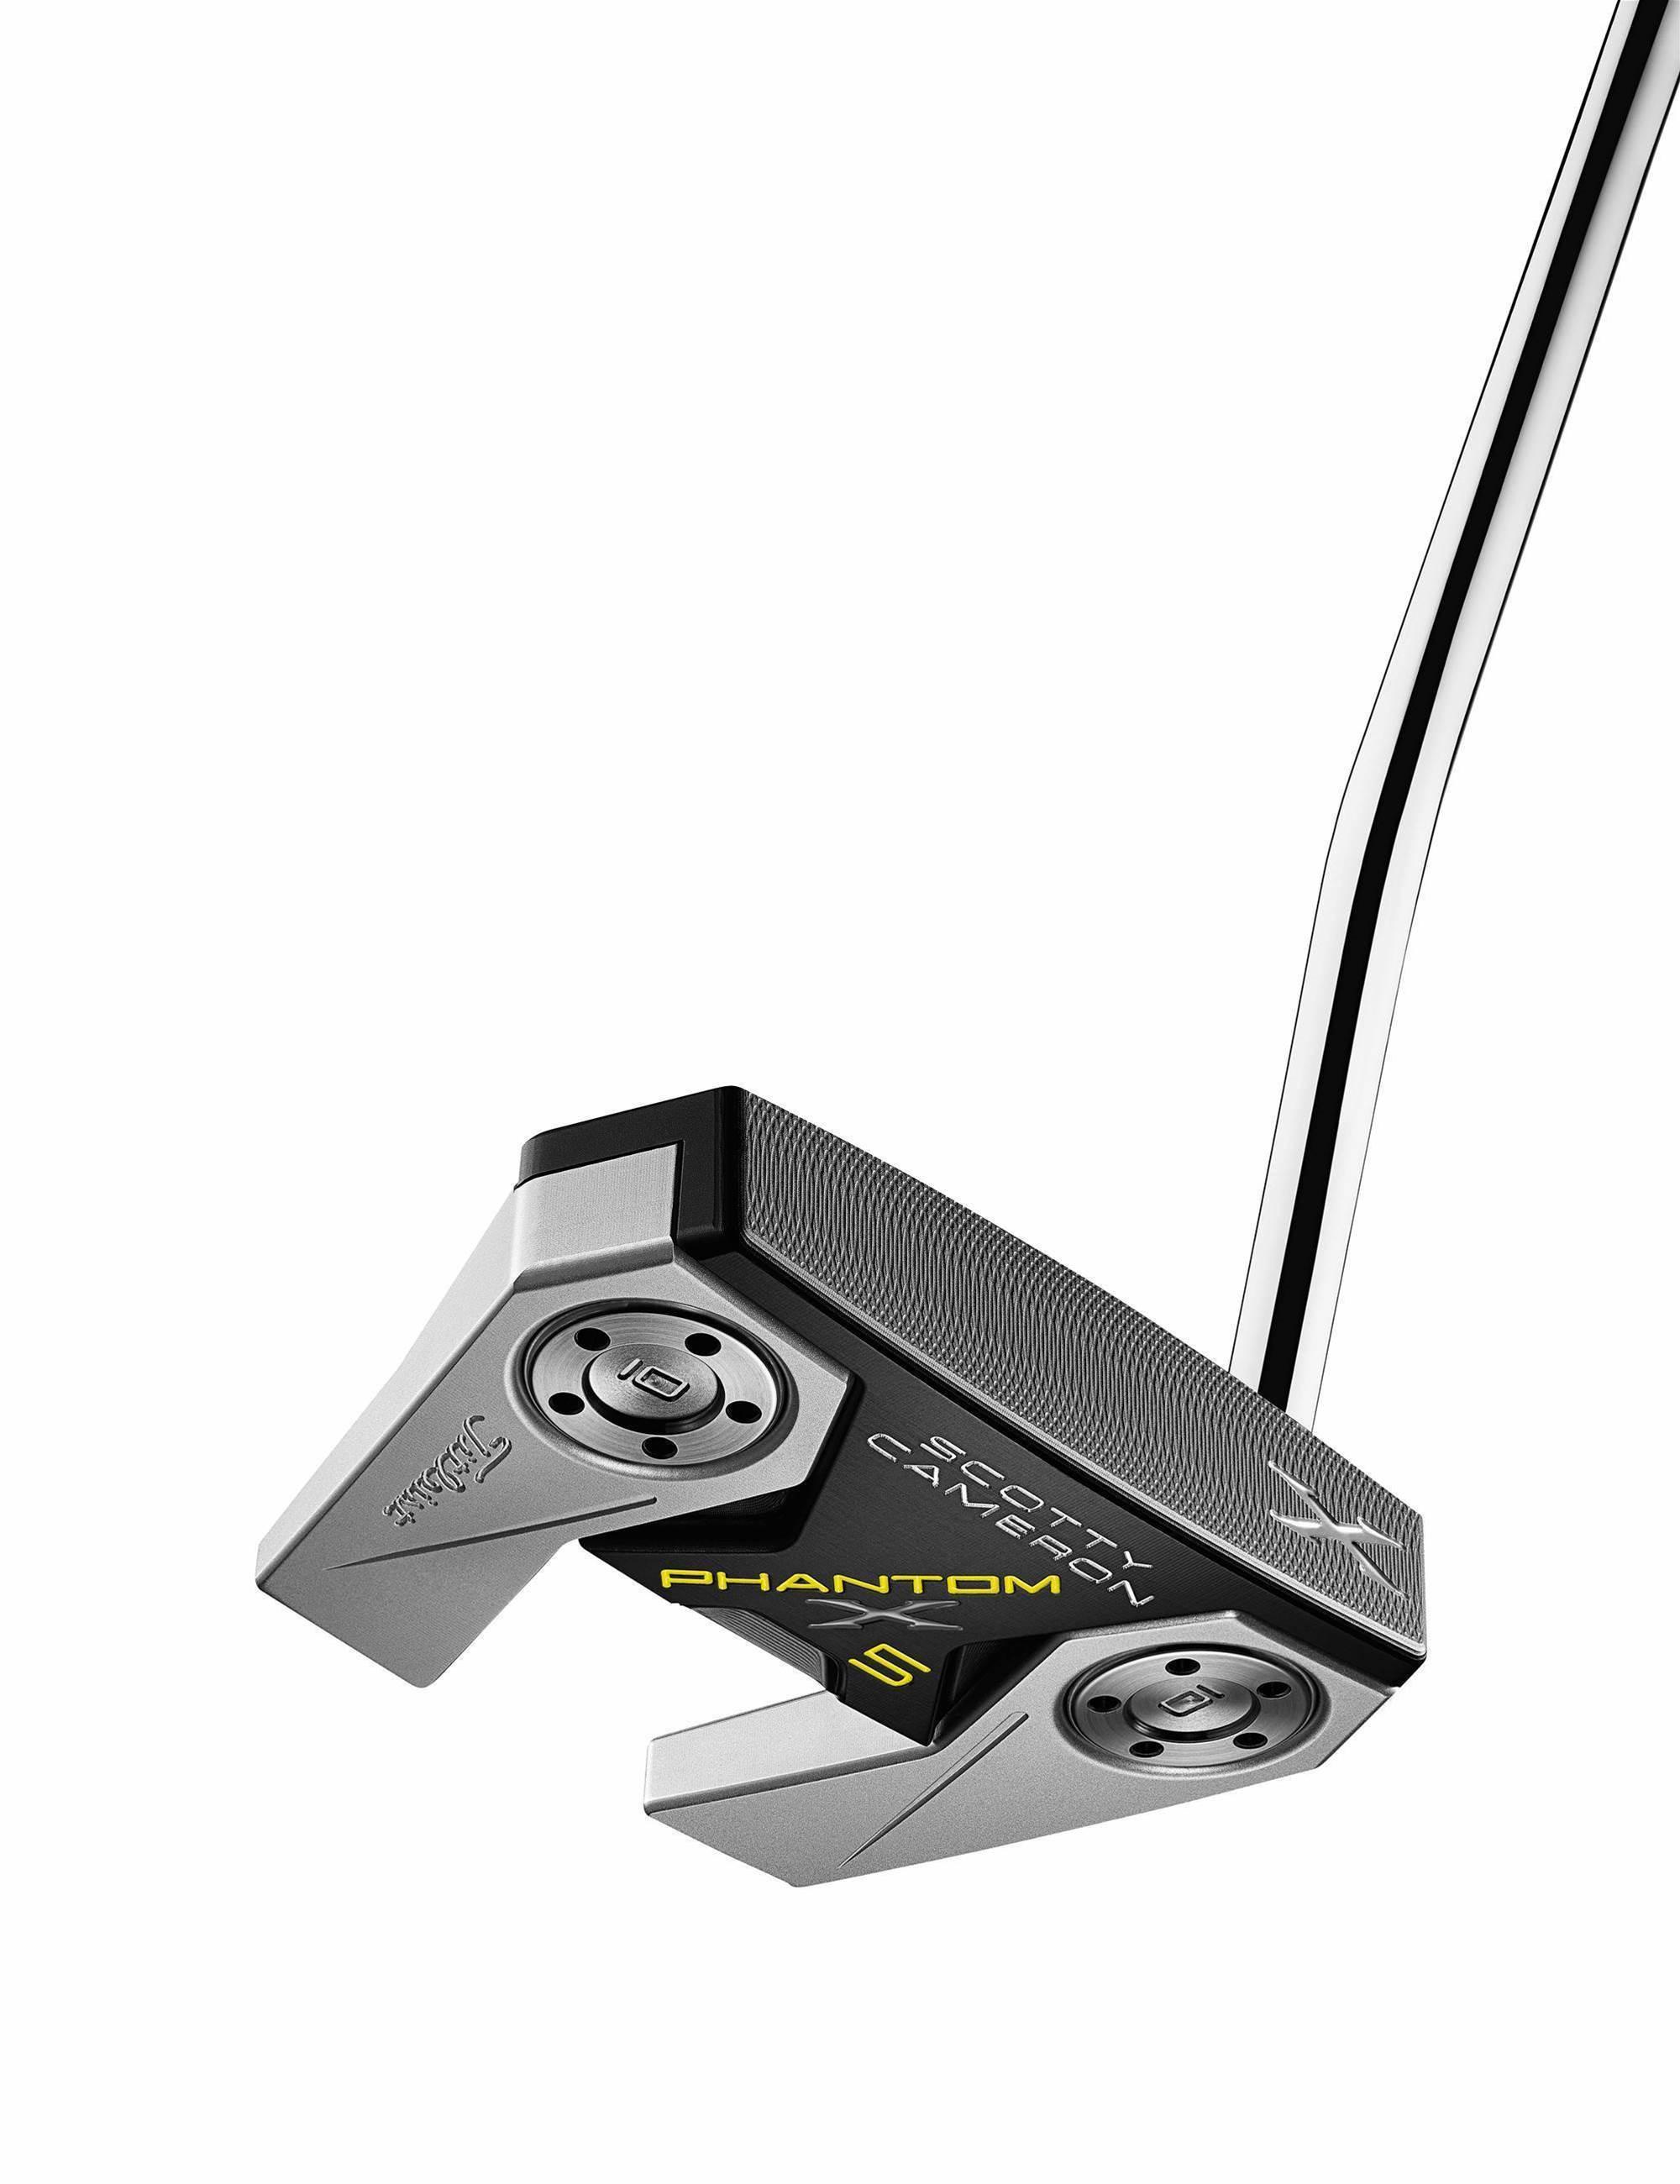 New Scotty Cameron Phantom X Putters - Golf Australia Magazine